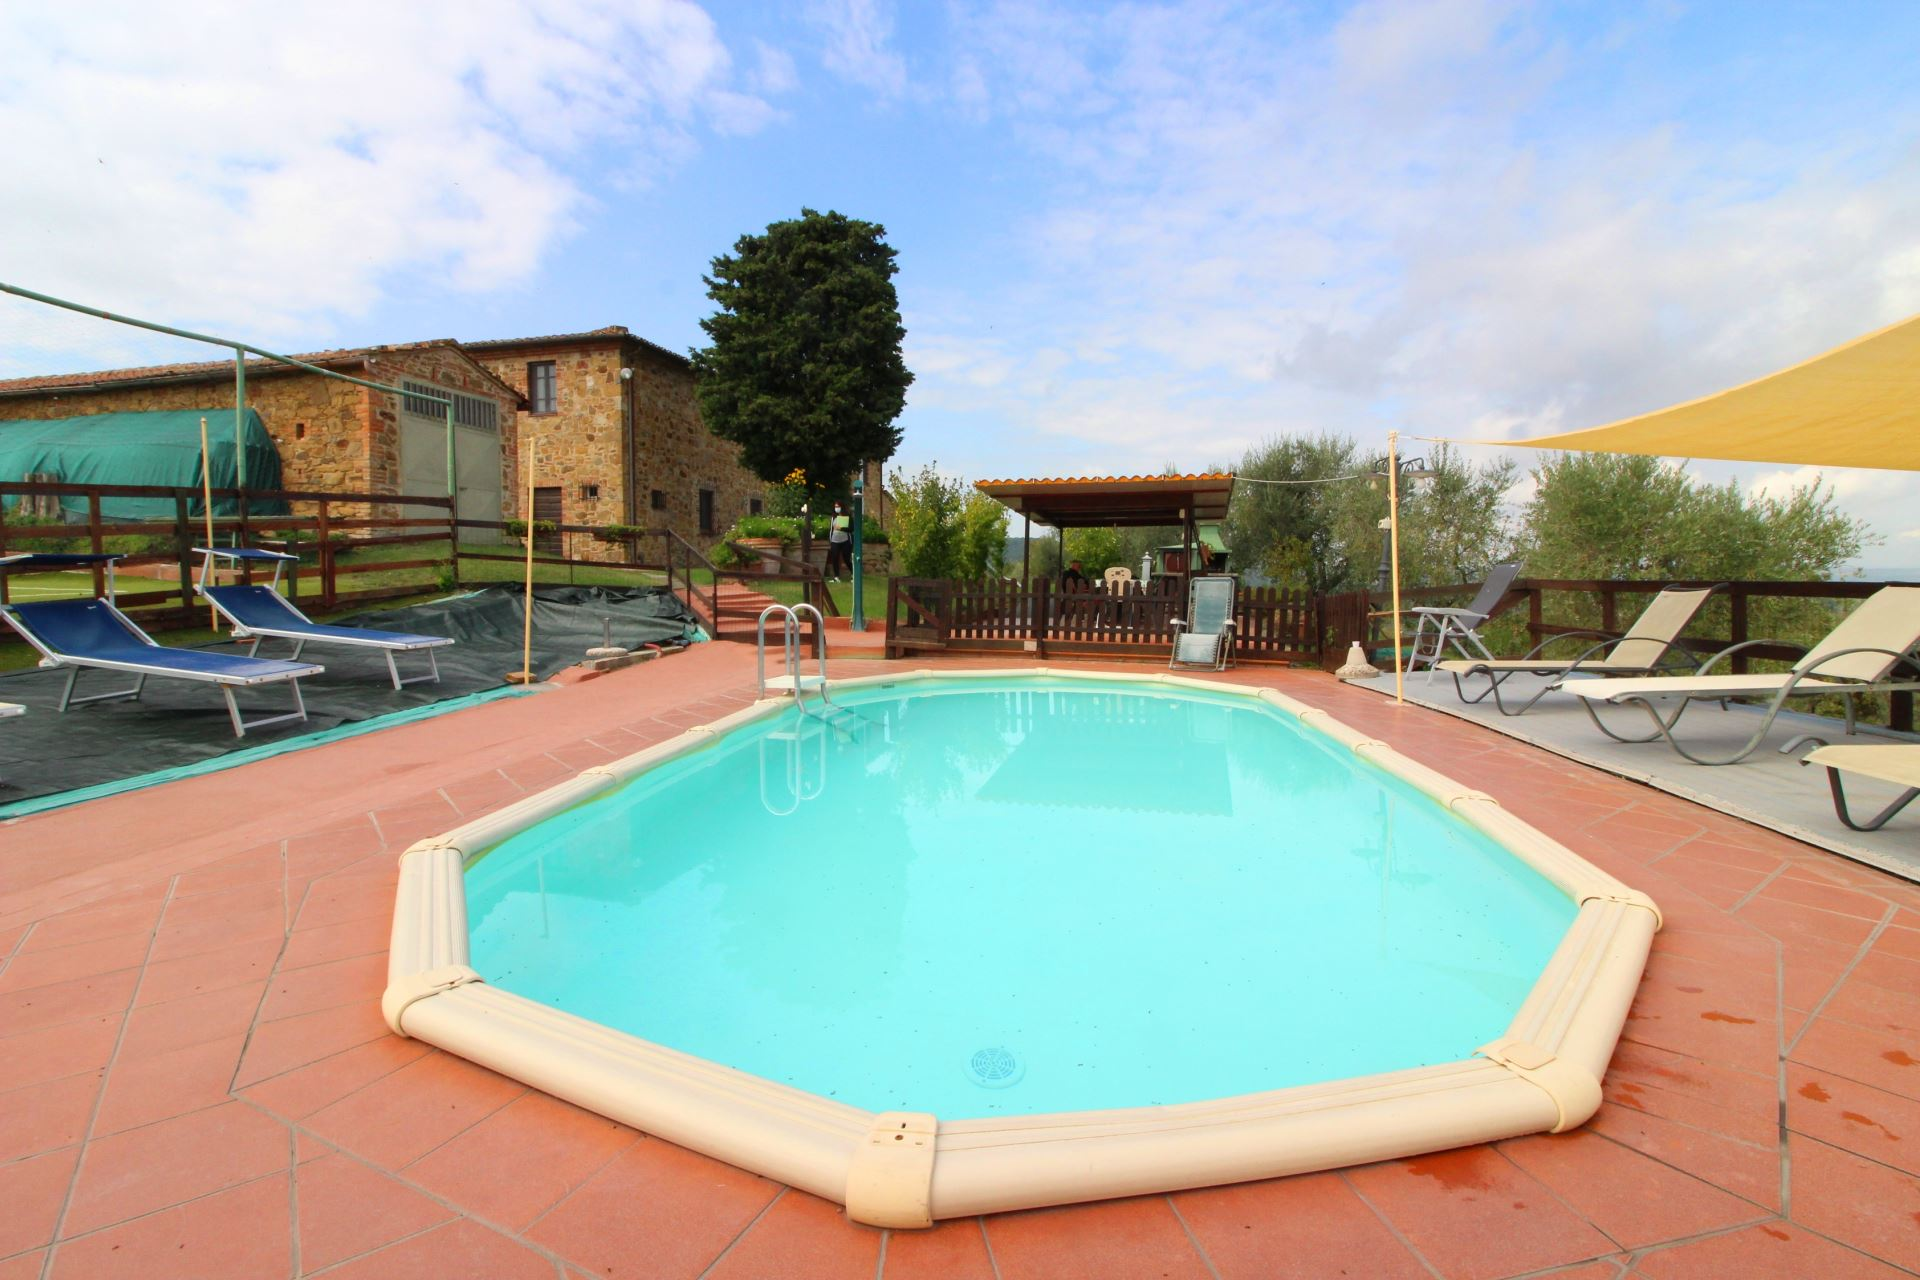 Casa Bella pool